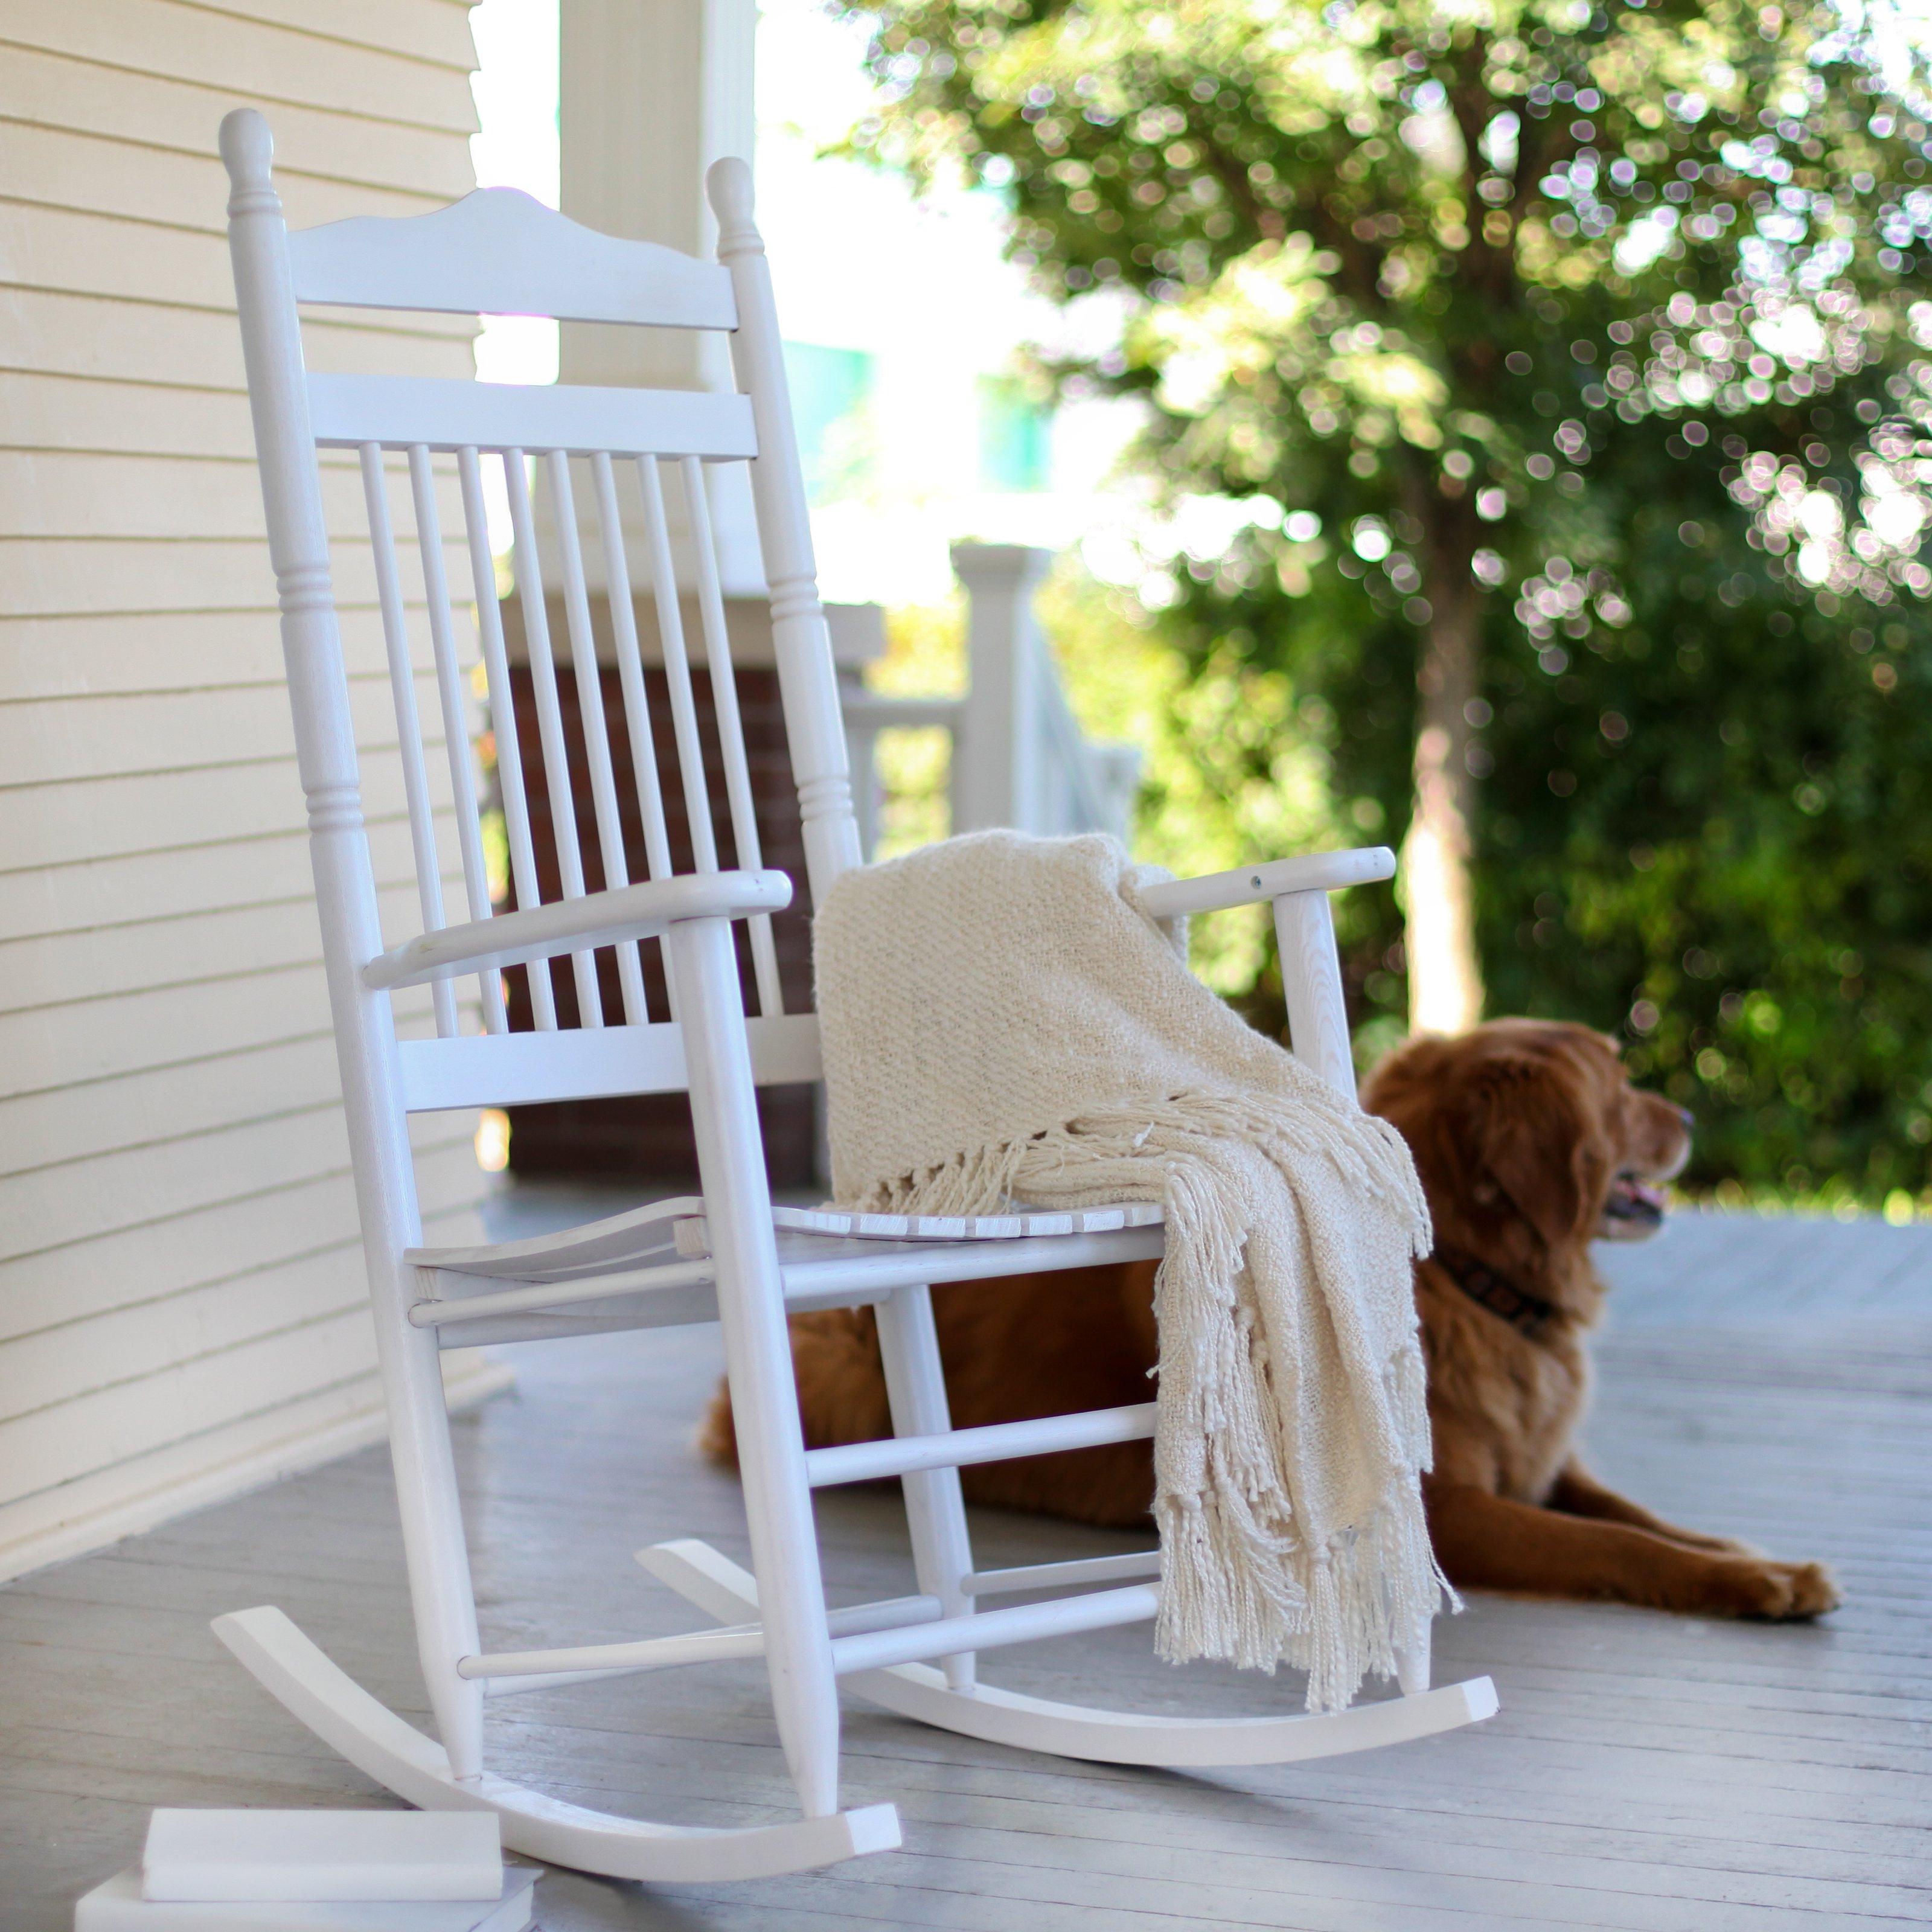 outdoor rocking chairs coral coast indoor/outdoor mission slat rocking chair - white - outdoor  rocking BRYAHTC